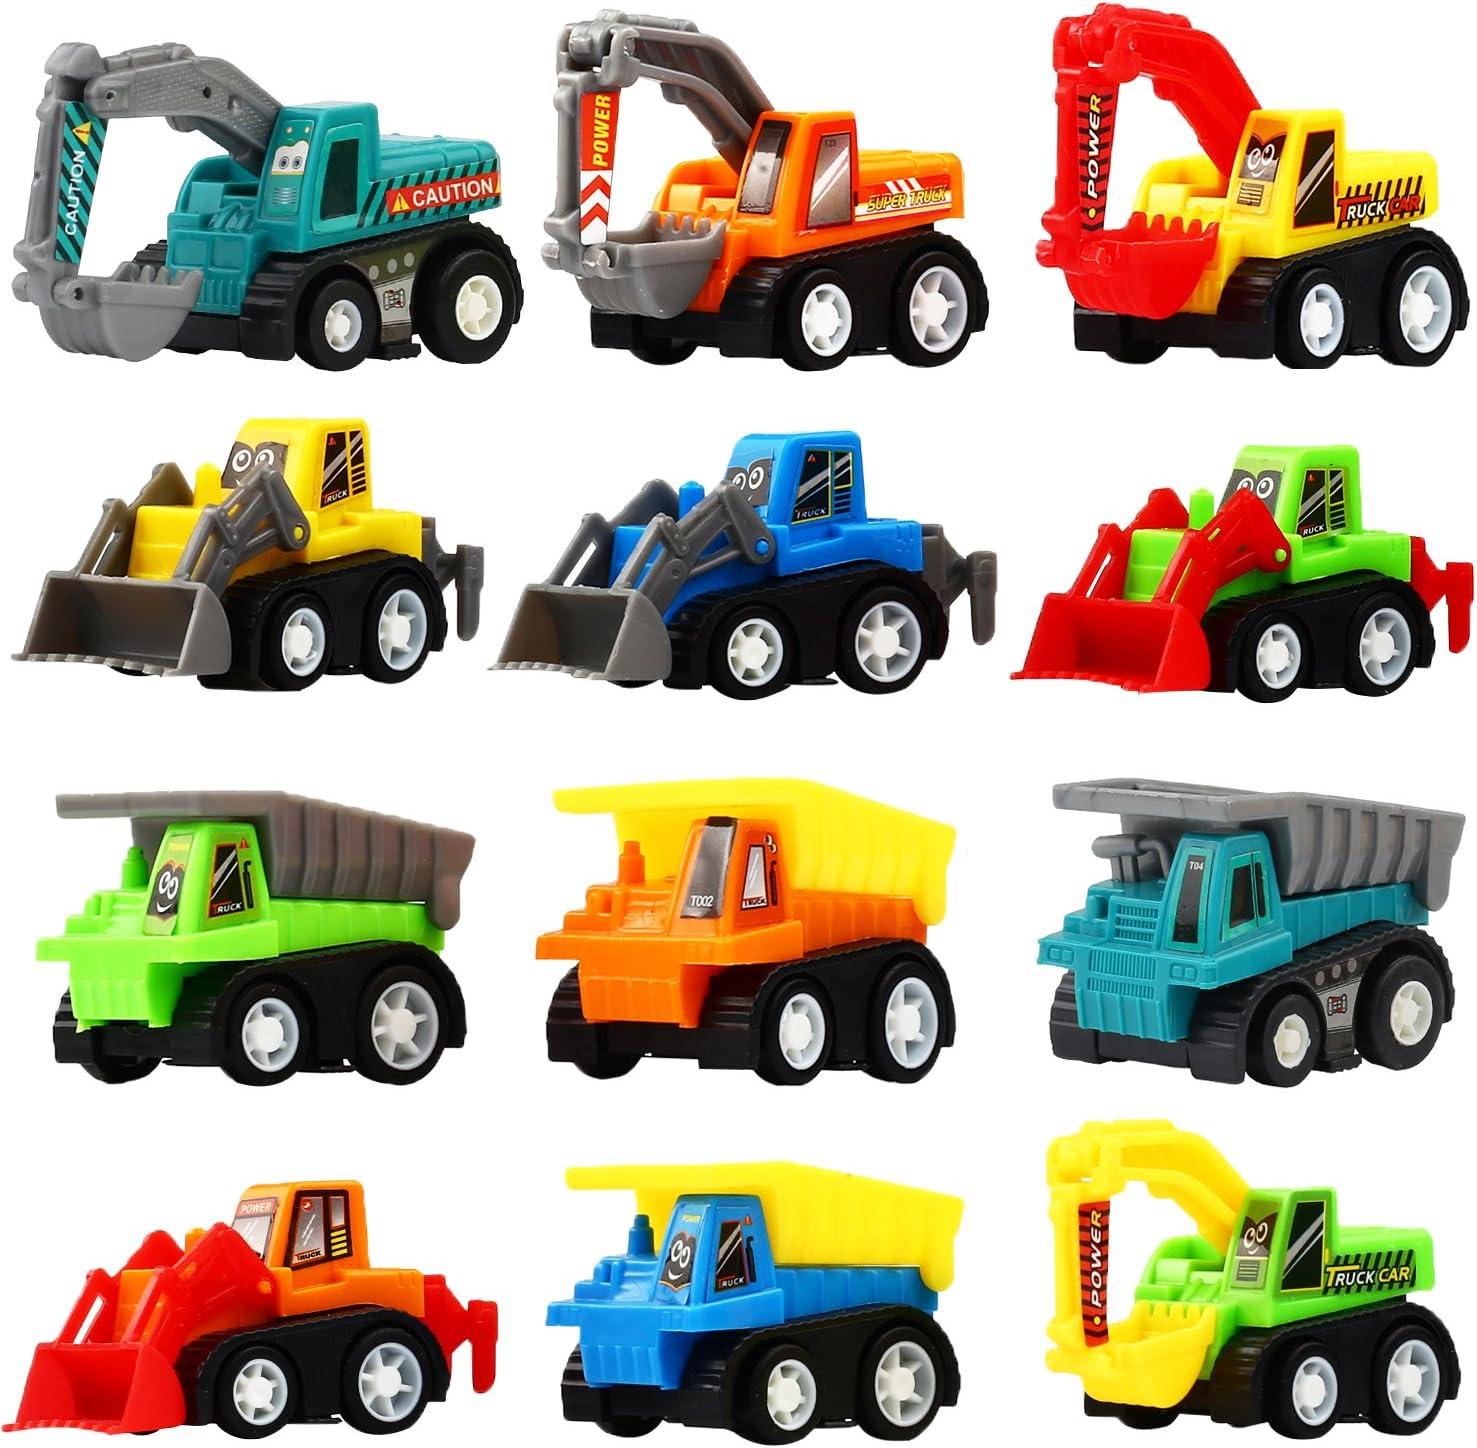 Truck Model mini small Construction Toy 6 Pcs//Set Kid Vehicle For Children gift